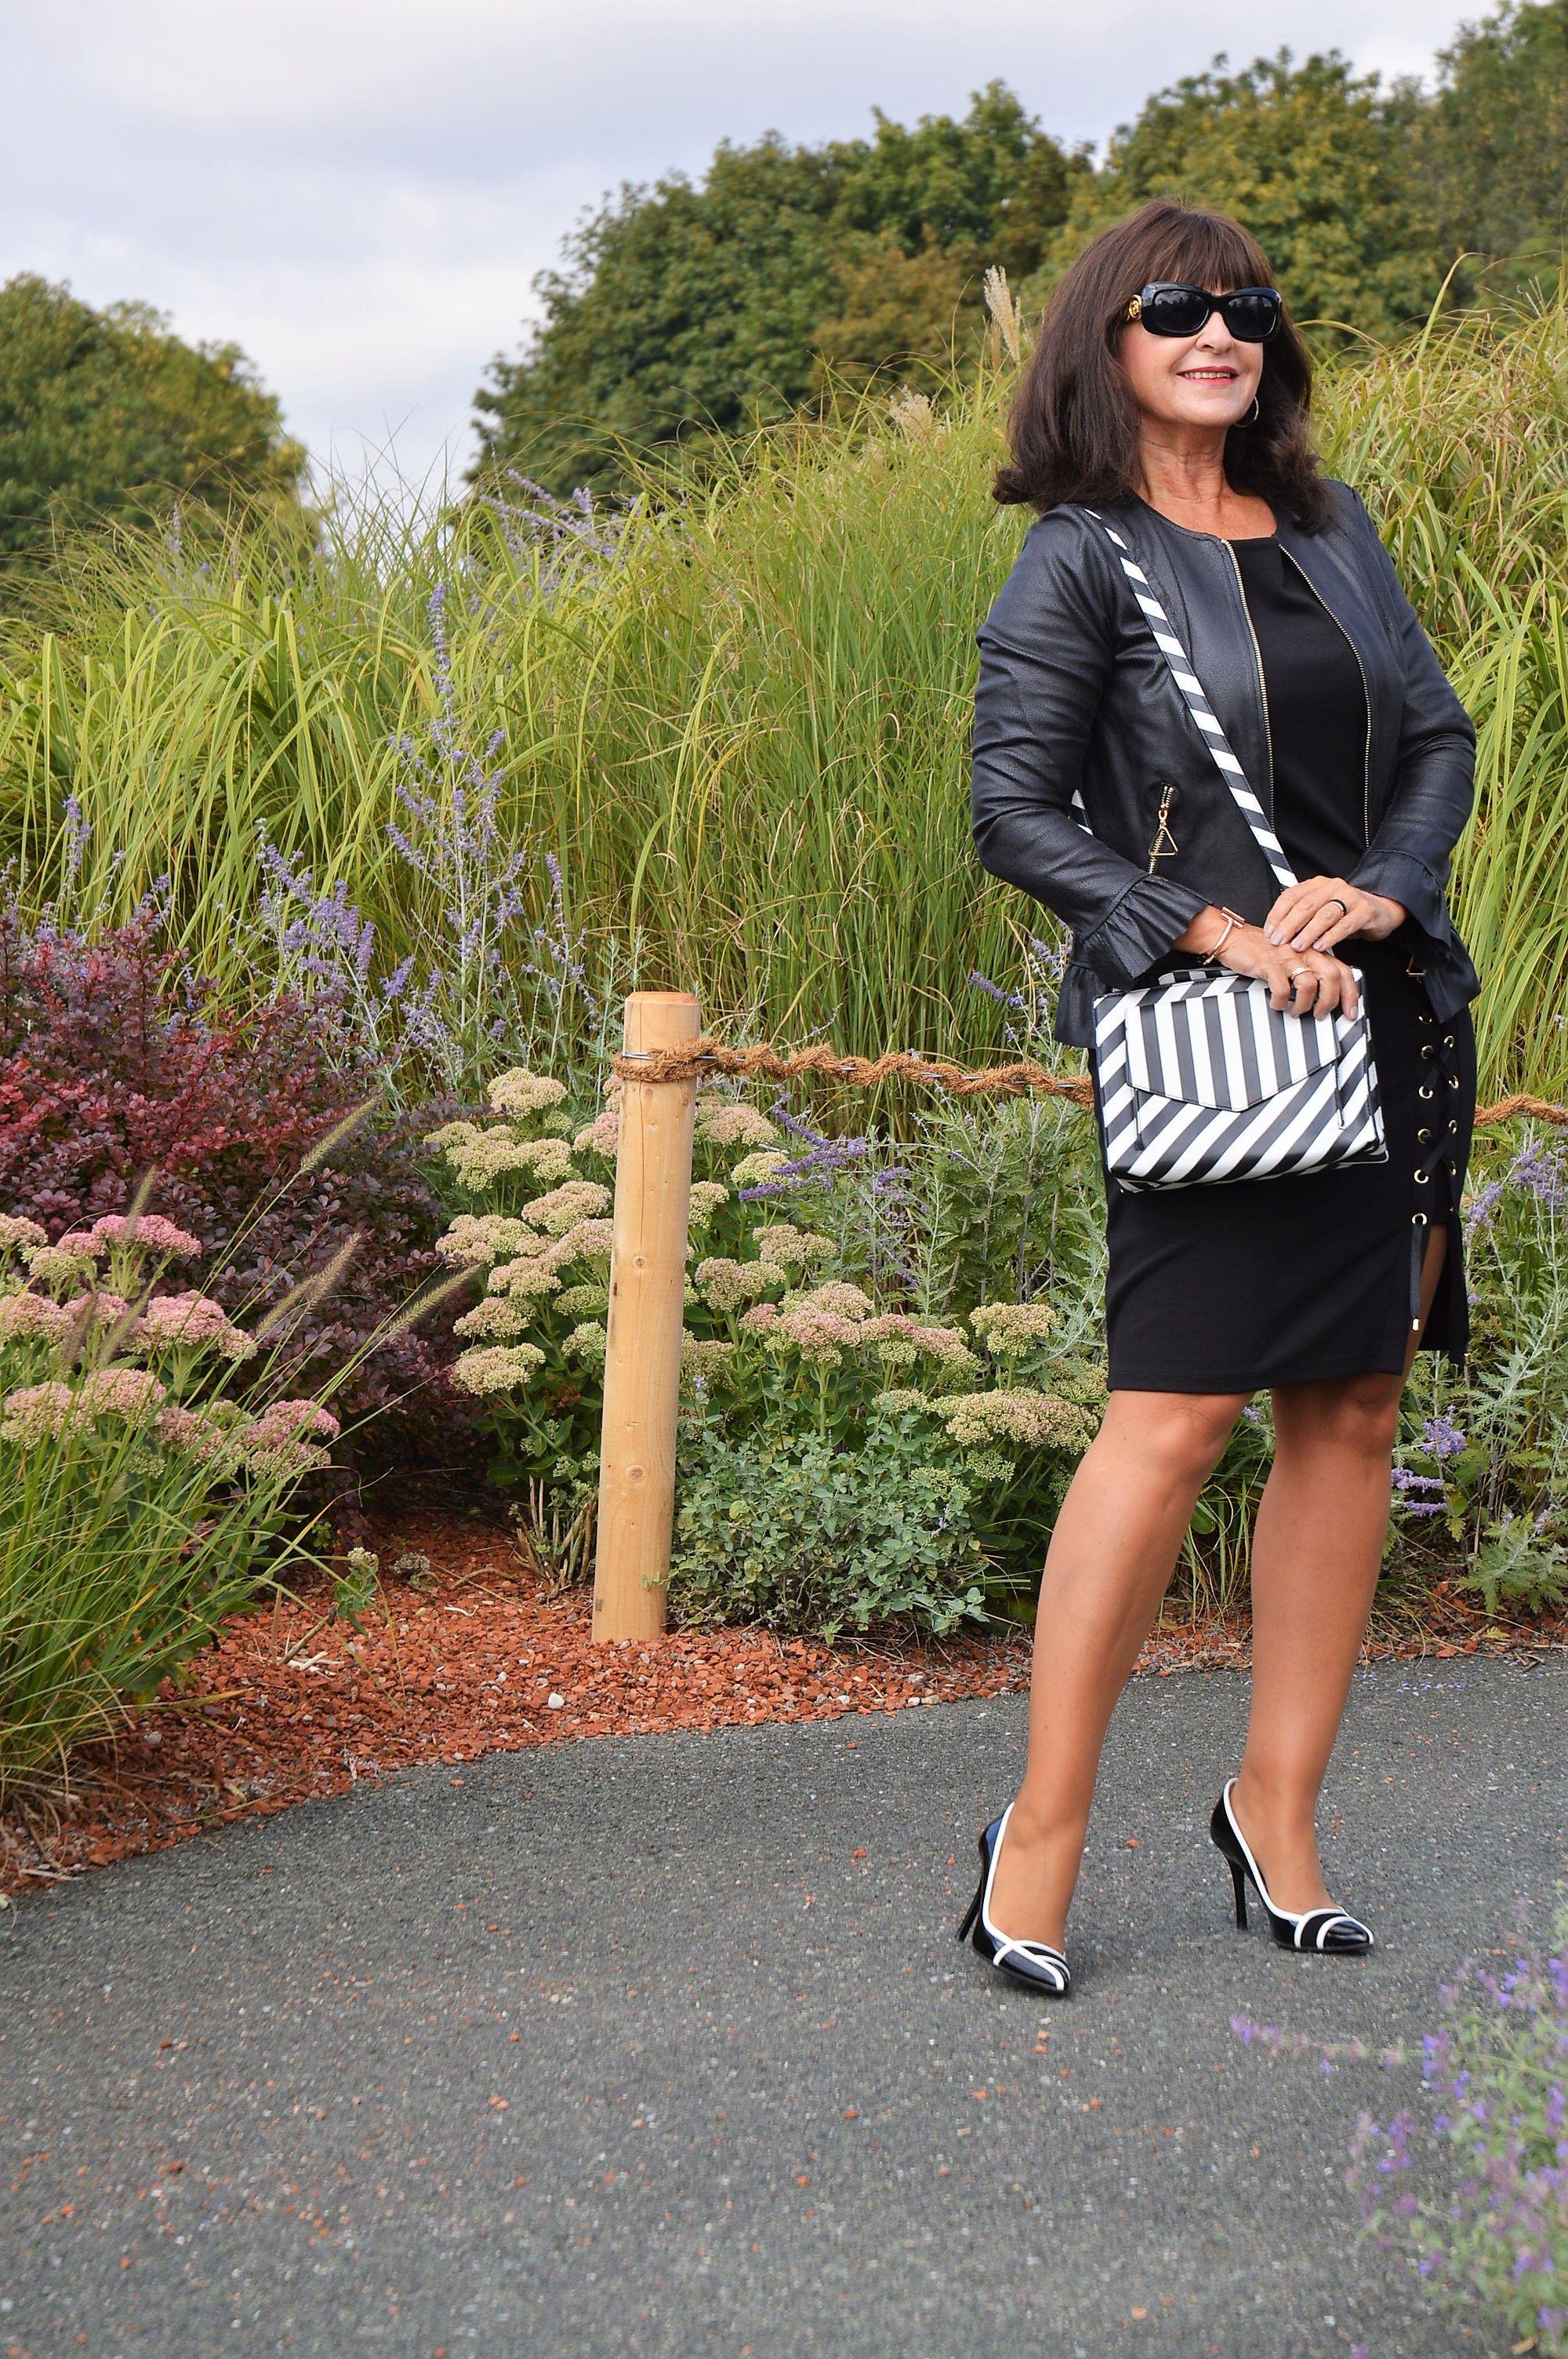 martina berg - lady 50plus - fashion. lifestyle. beauty